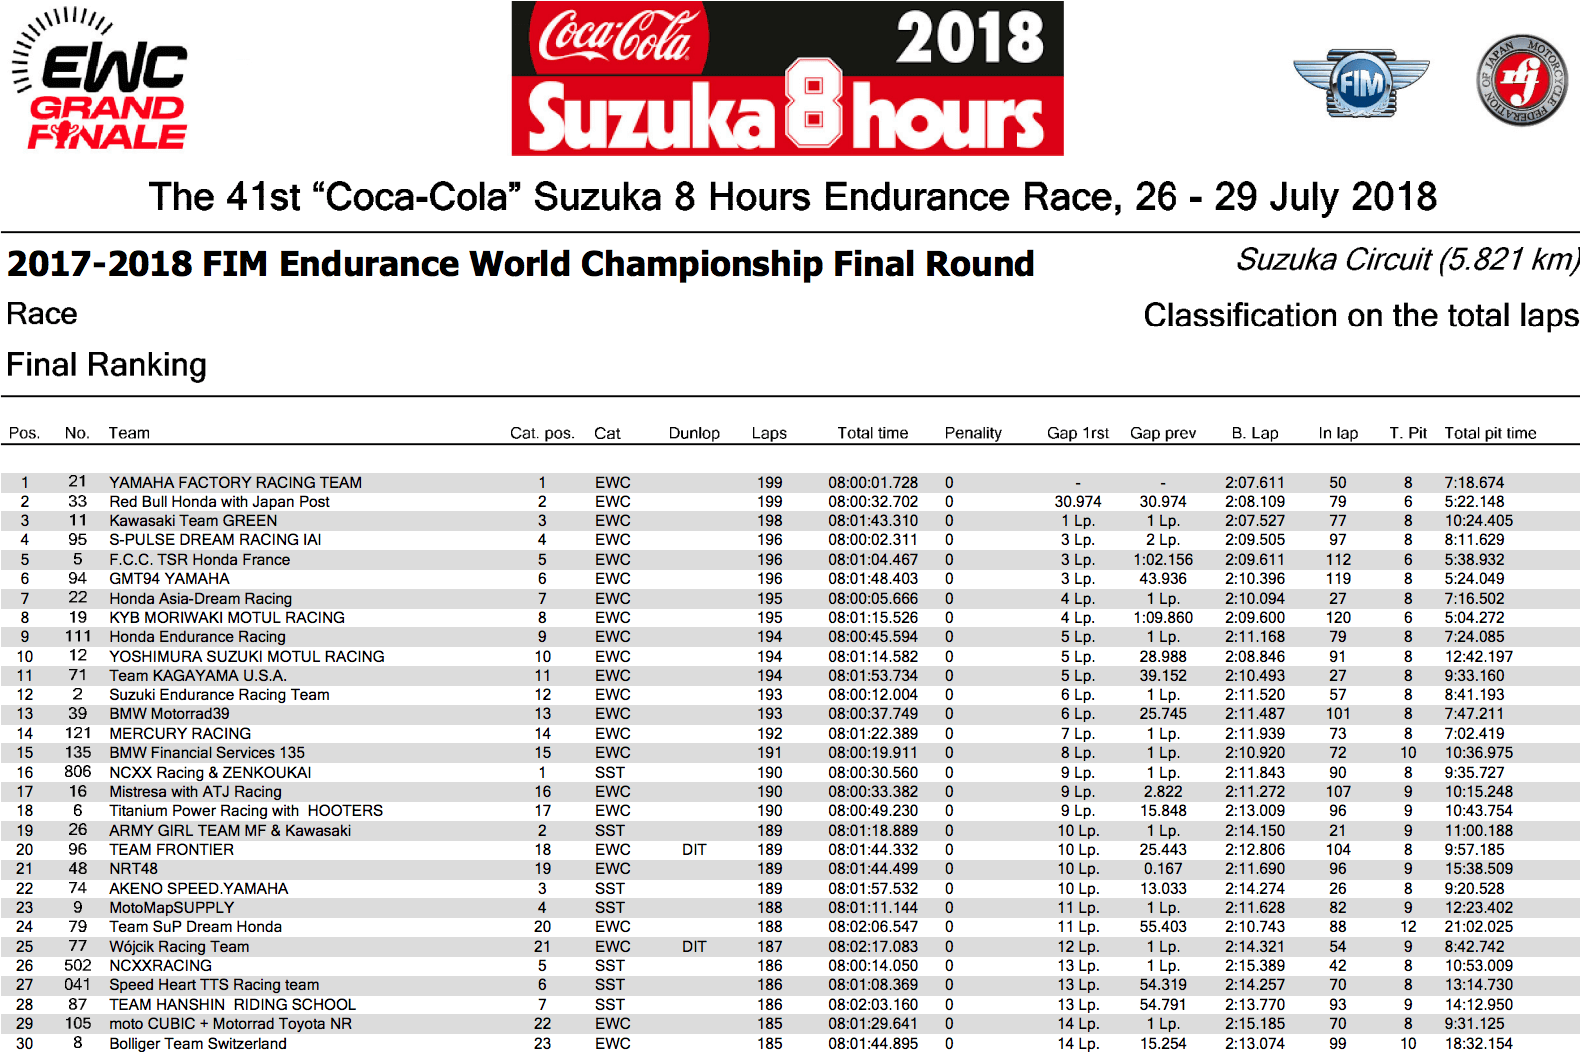 ★FIM世界耐久選手権シリーズ 鈴鹿8時間耐久 決勝レース結果